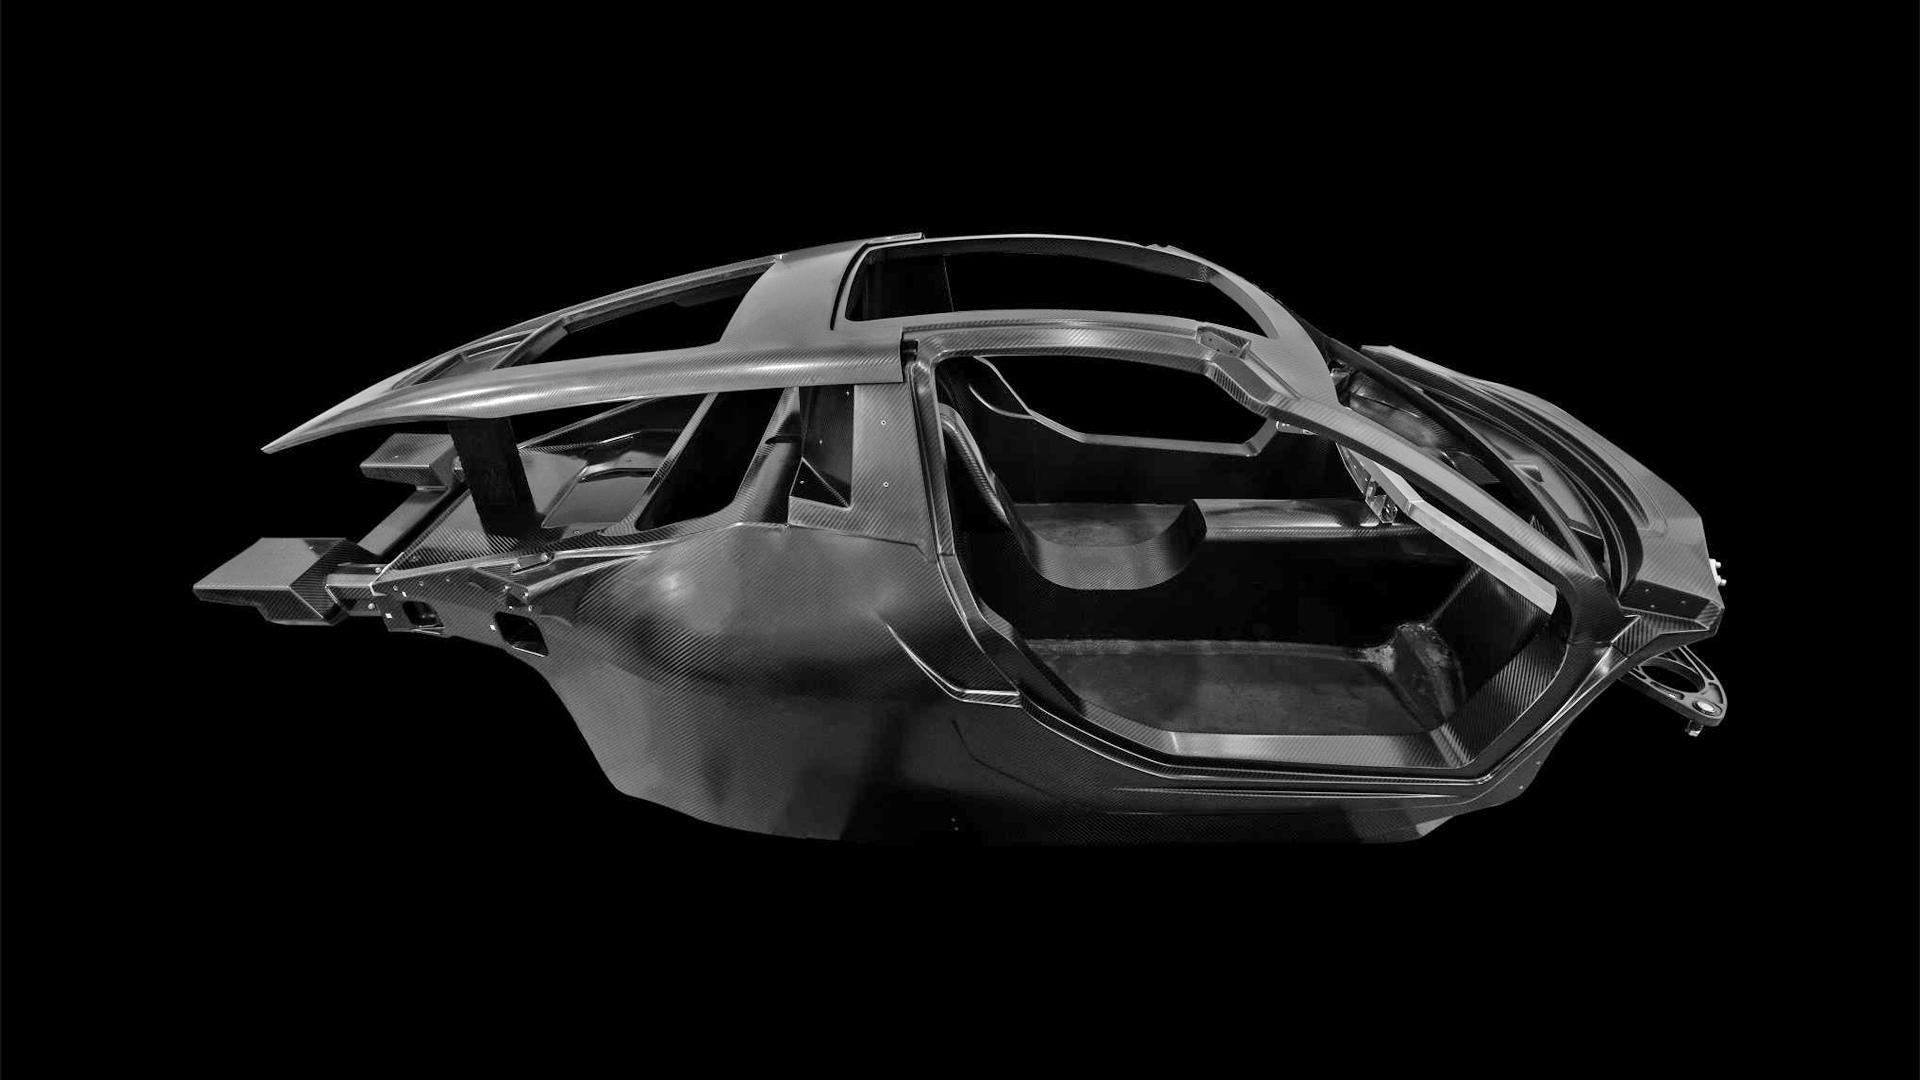 Hispano Suiza Carmen Carbon Fibre Monocoque